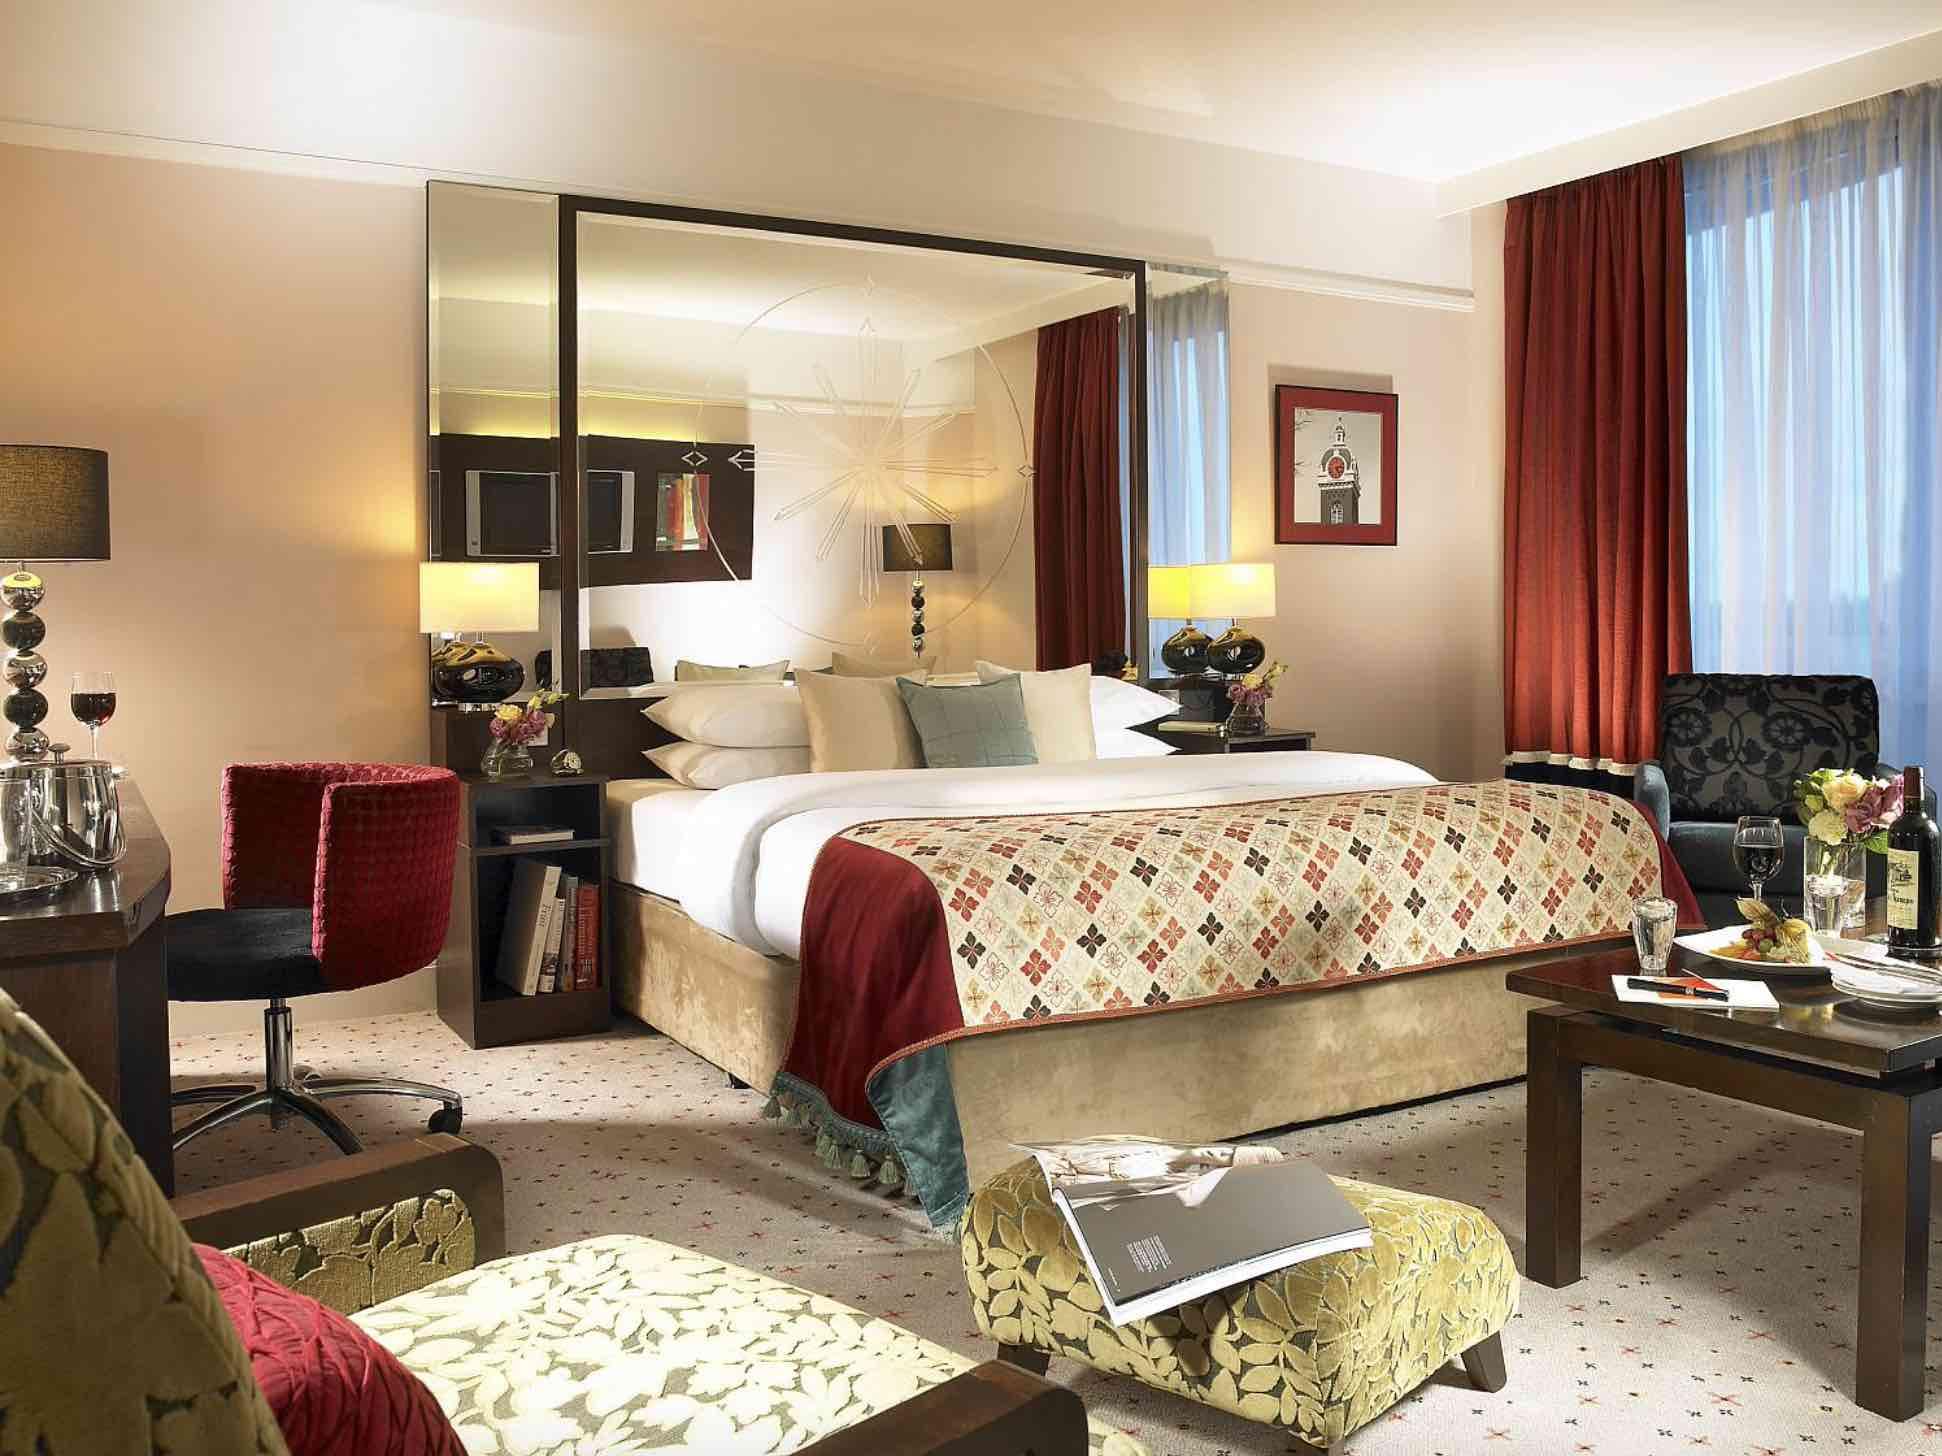 Carlton Hotel Blanchardstown luxury bedroom suite with 4 poster bed